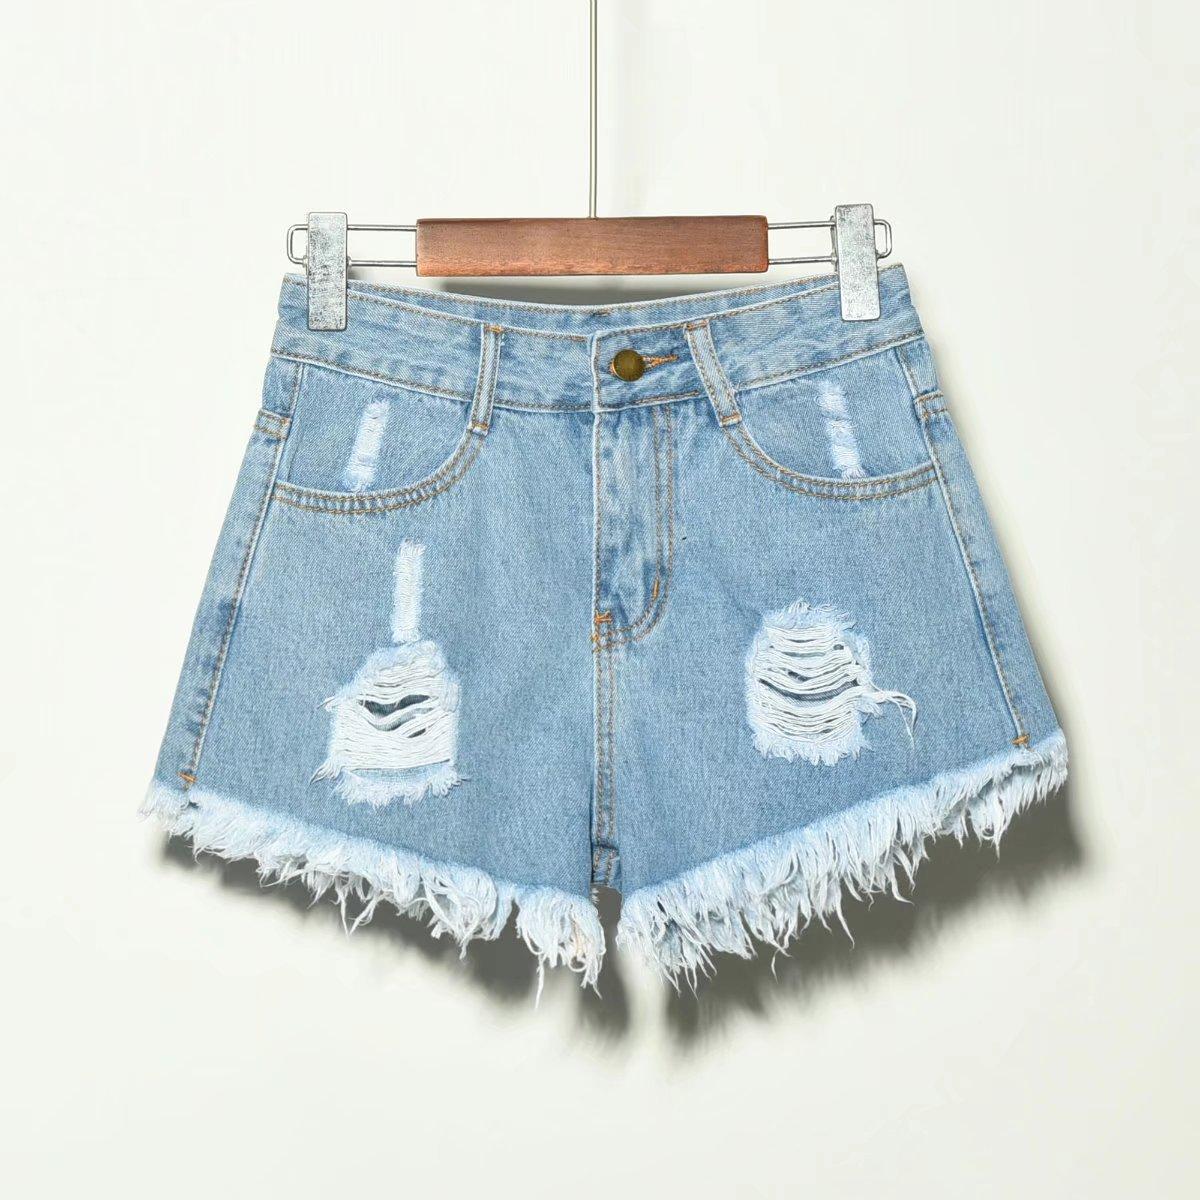 Iraq I Clothing Fat Mm180 Jin With Holes Tassels Flash Frayed Large Size Denim Shorts Hot Pants Summer Women's